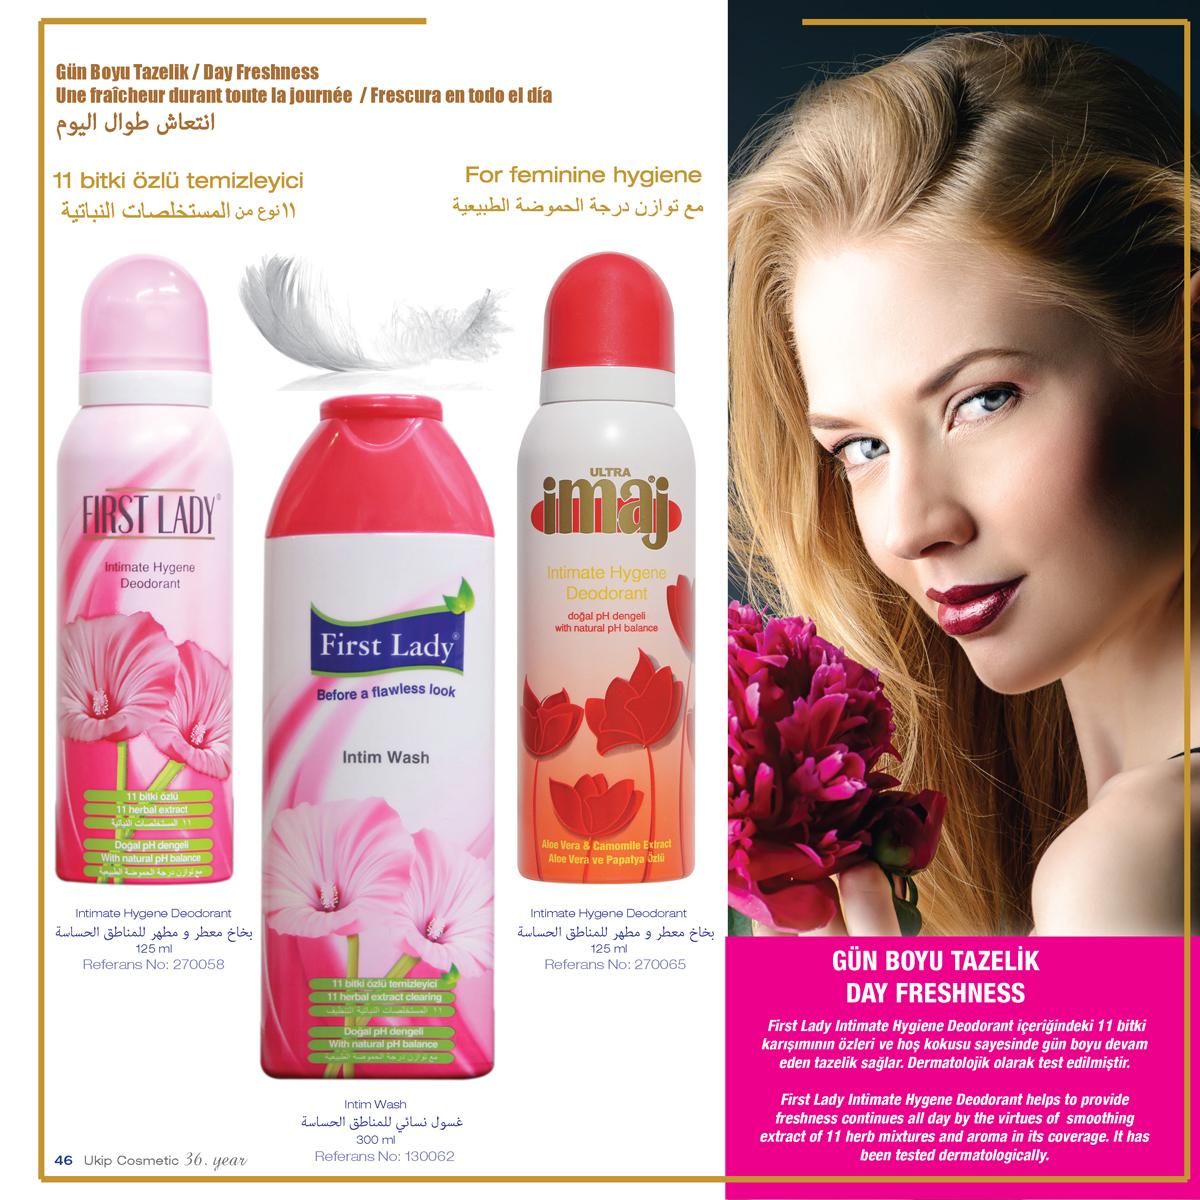 First Lady Intimate Hygiene Deodorant